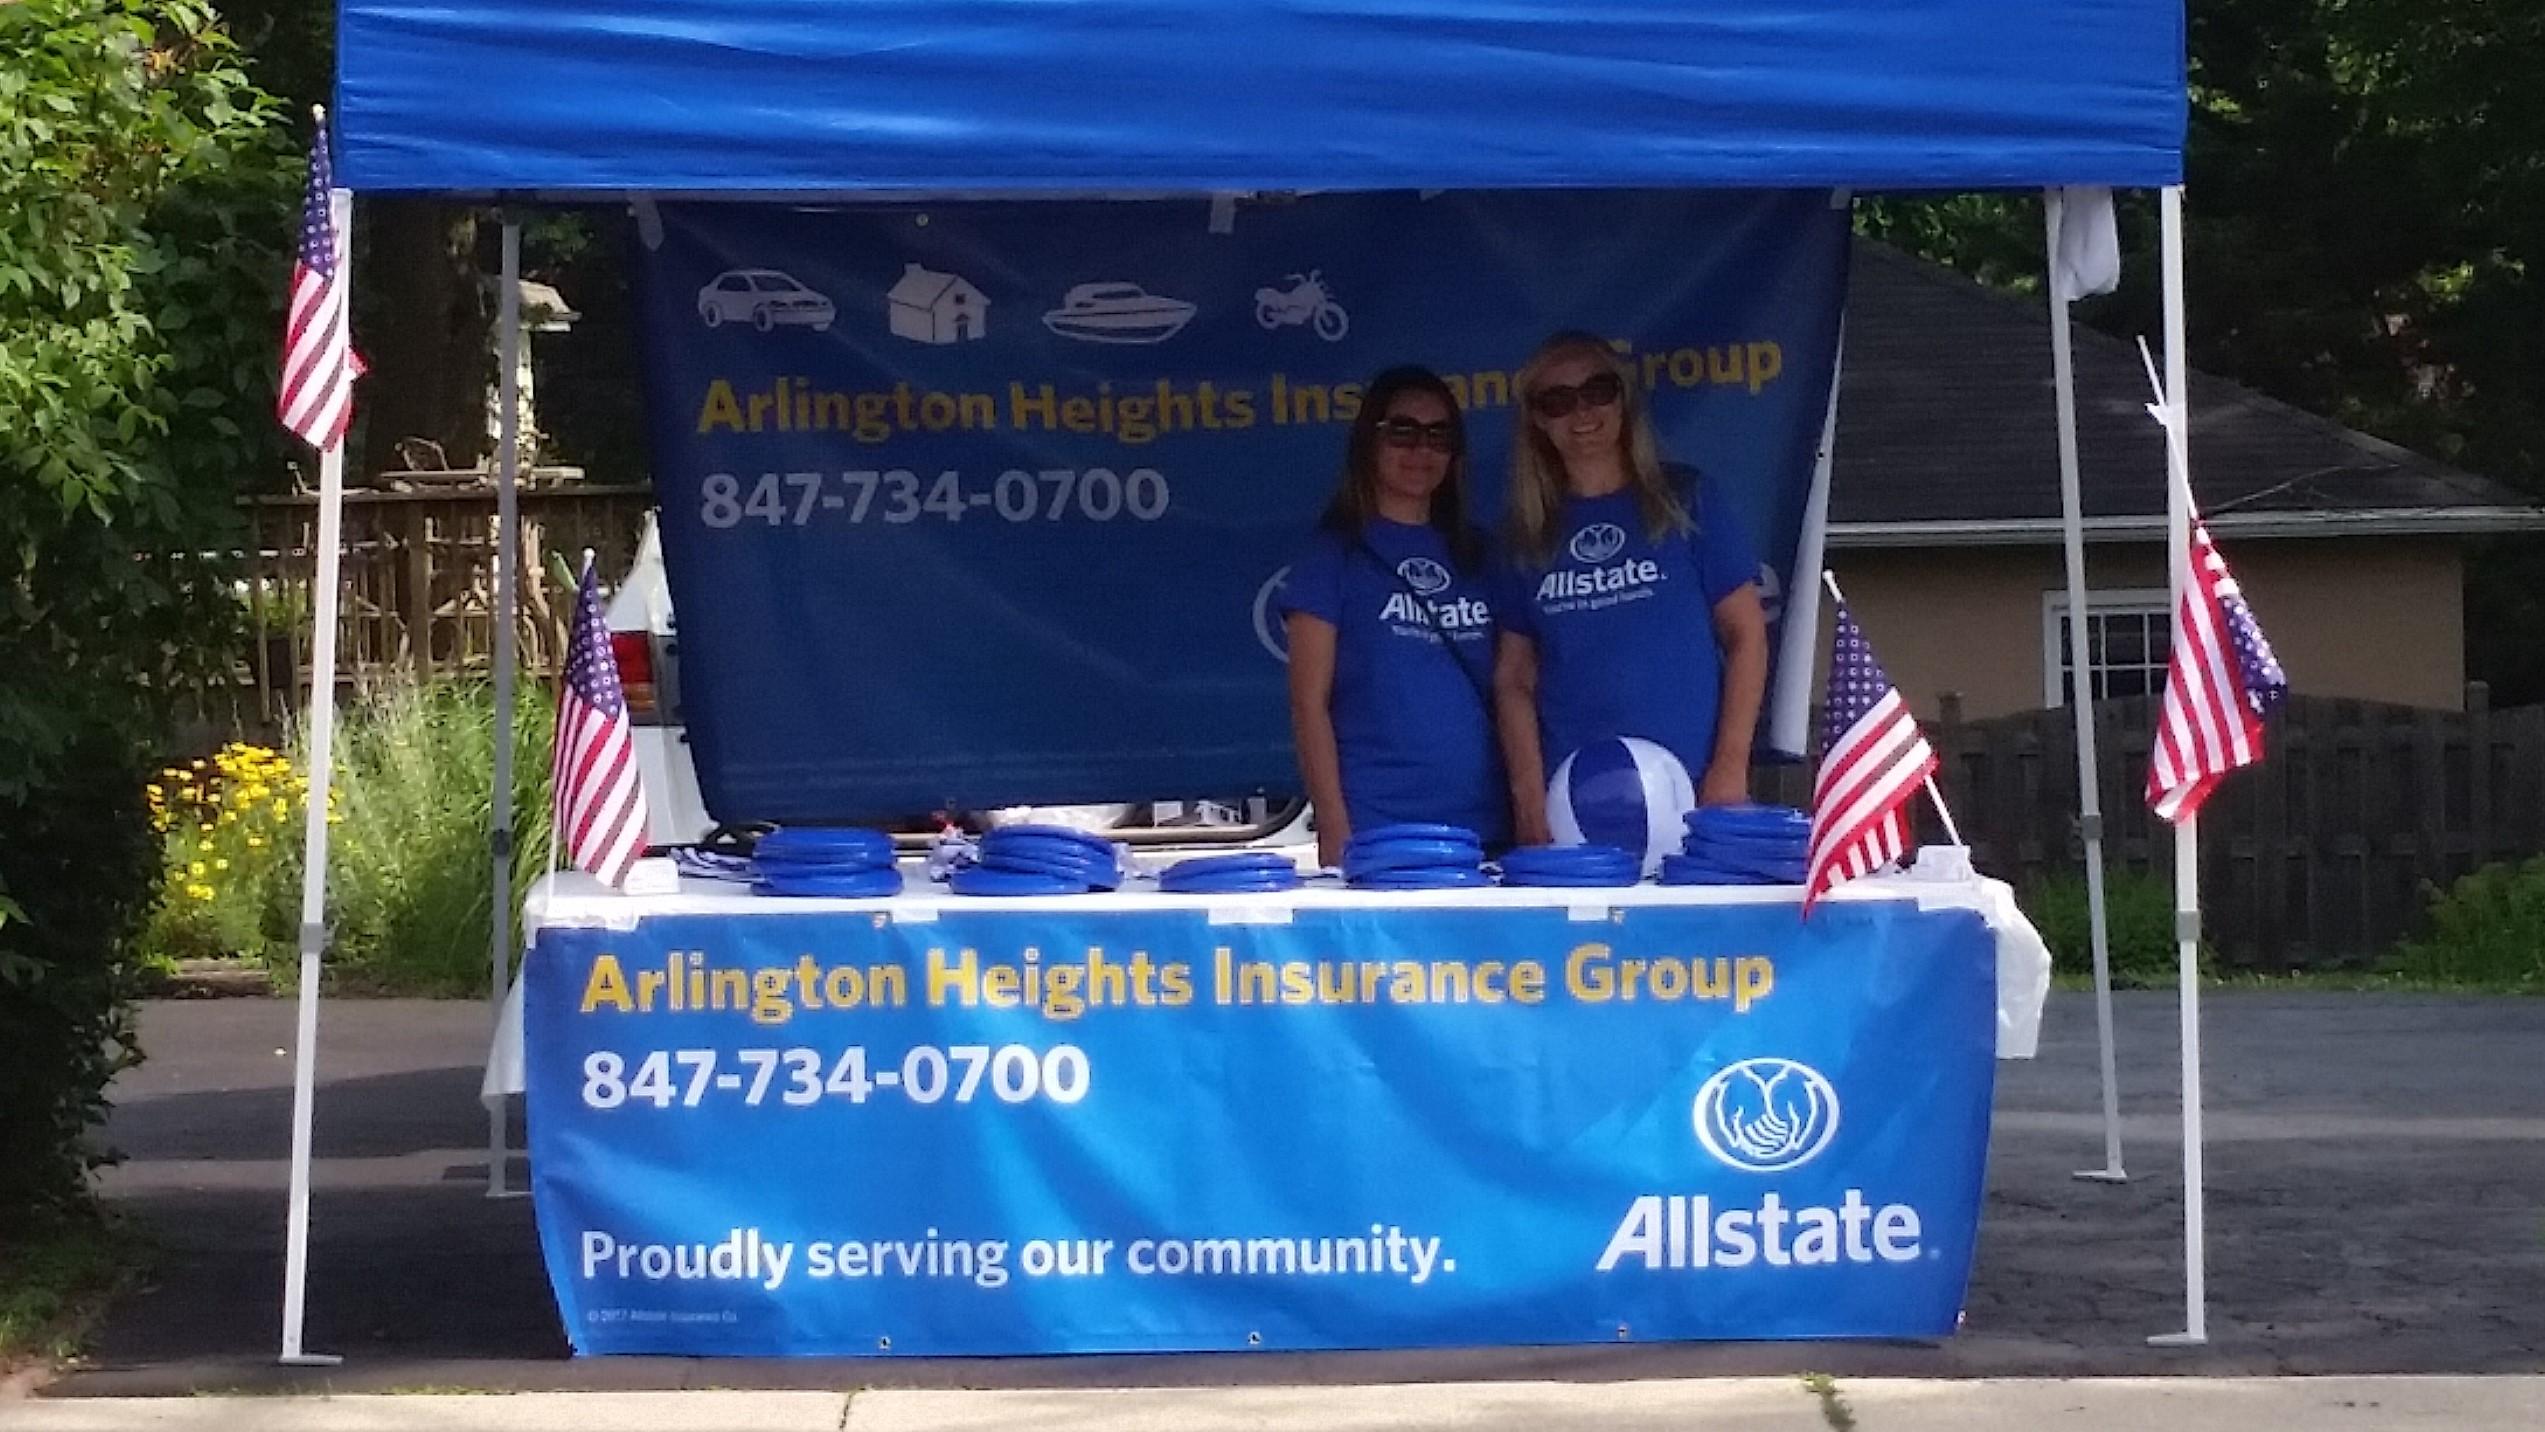 Arlington Heights Insurance Group, Inc.: Allstate Insurance image 2